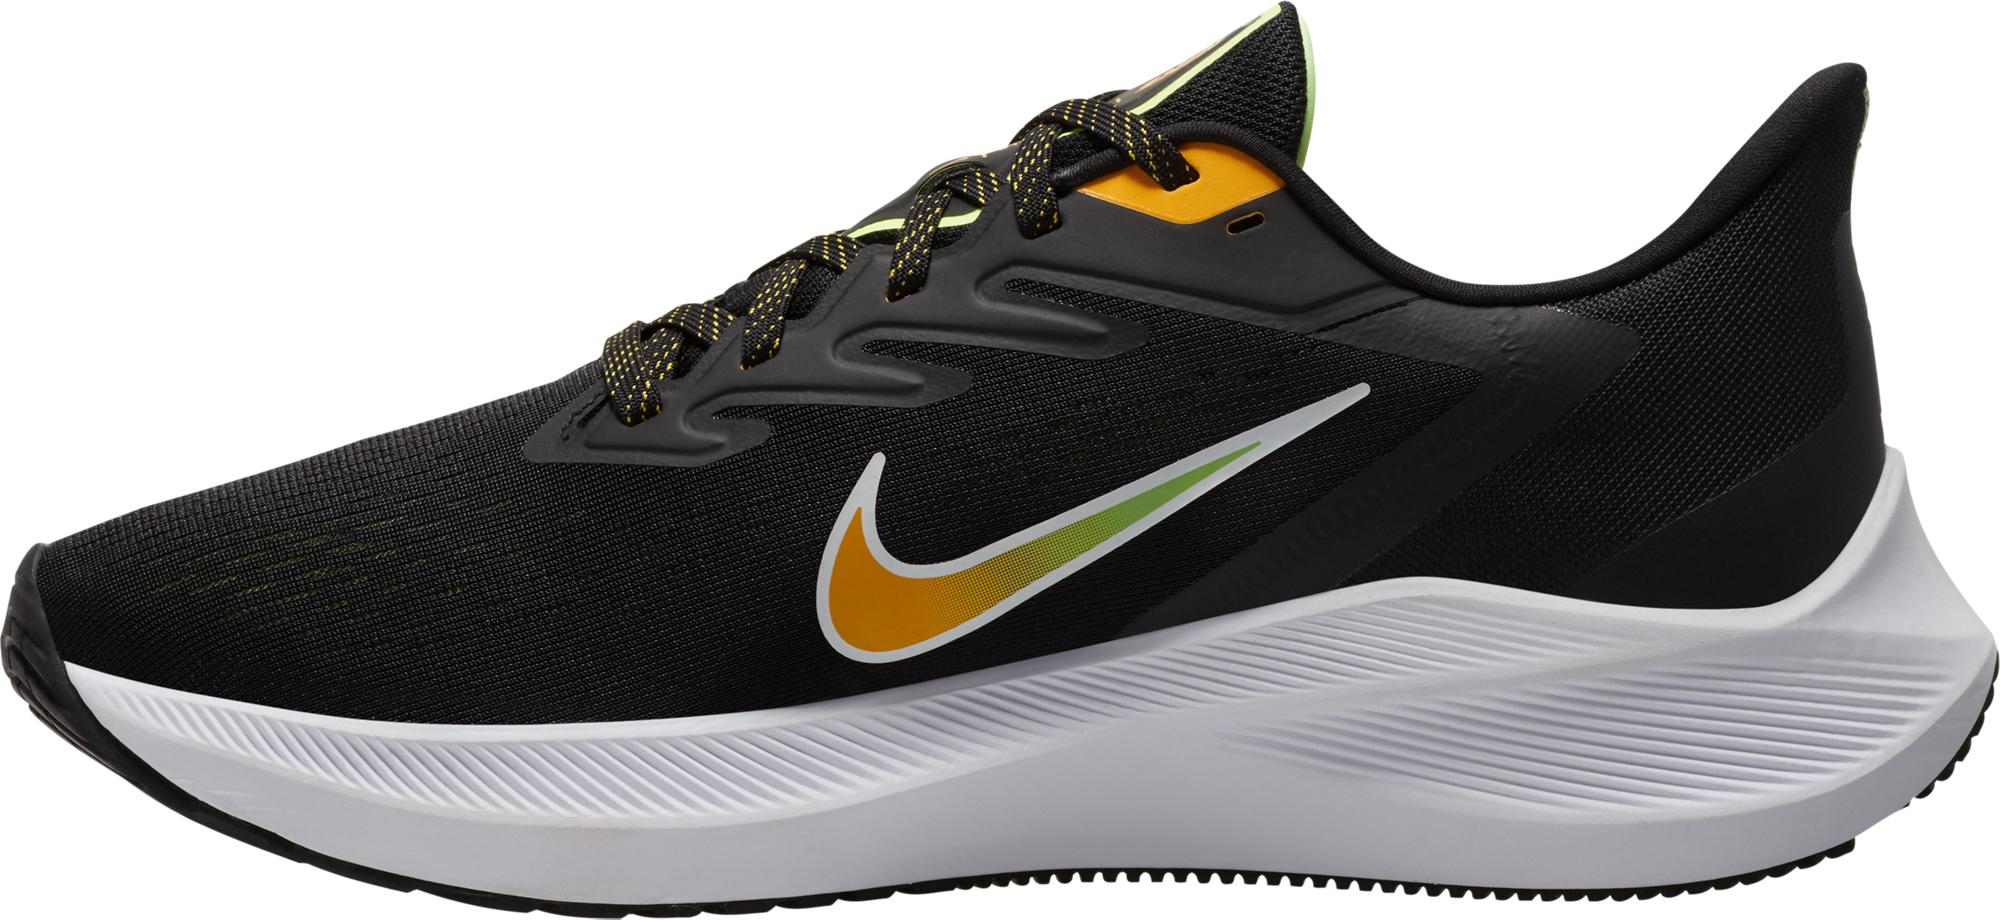 Фото - Nike Кроссовки мужские Nike Zoom Winflo 7, размер 43 кроссовки nike sb zoom stefan janoski